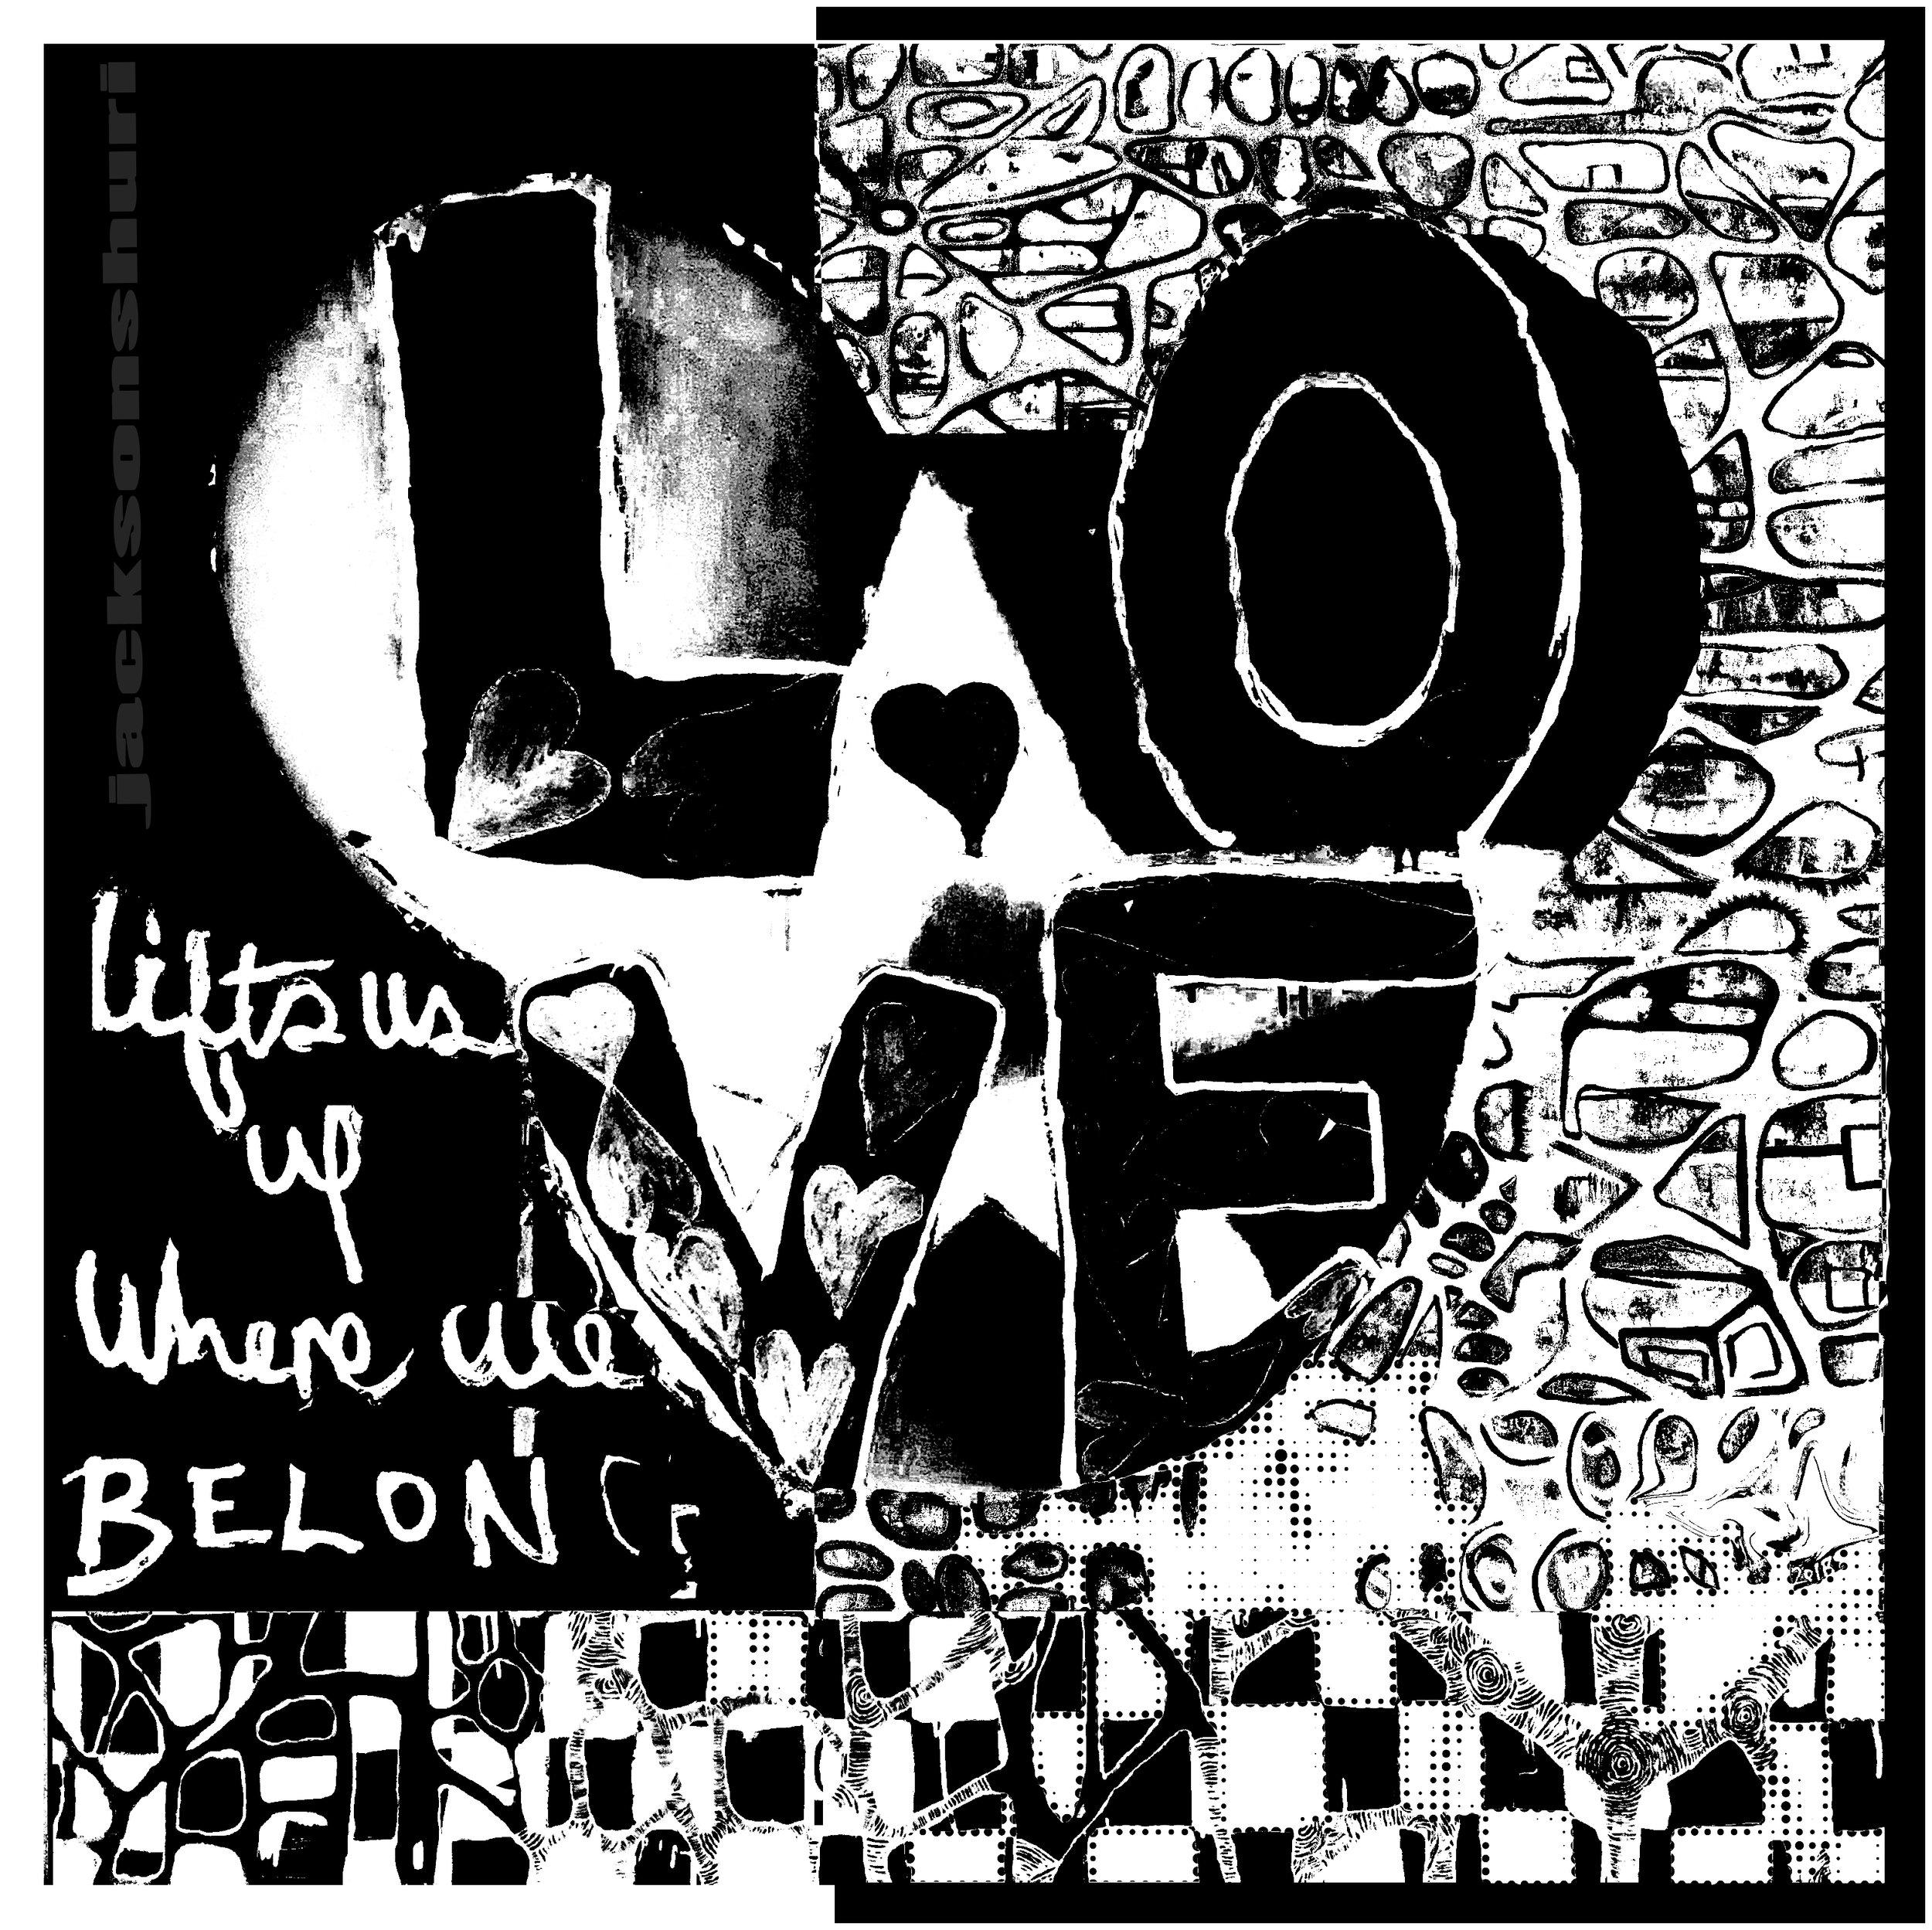 love-lifts-us-up-where-we-belong-jackson-shuri-digital-art1.jpg